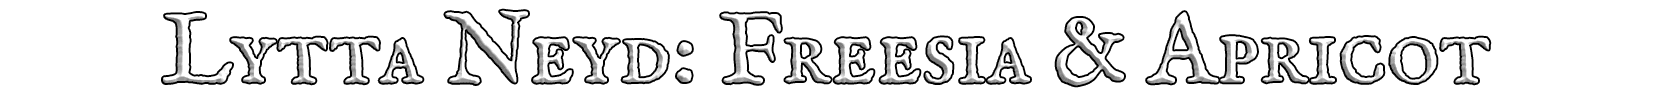 Lytta Neyd: Freesia & Apricot